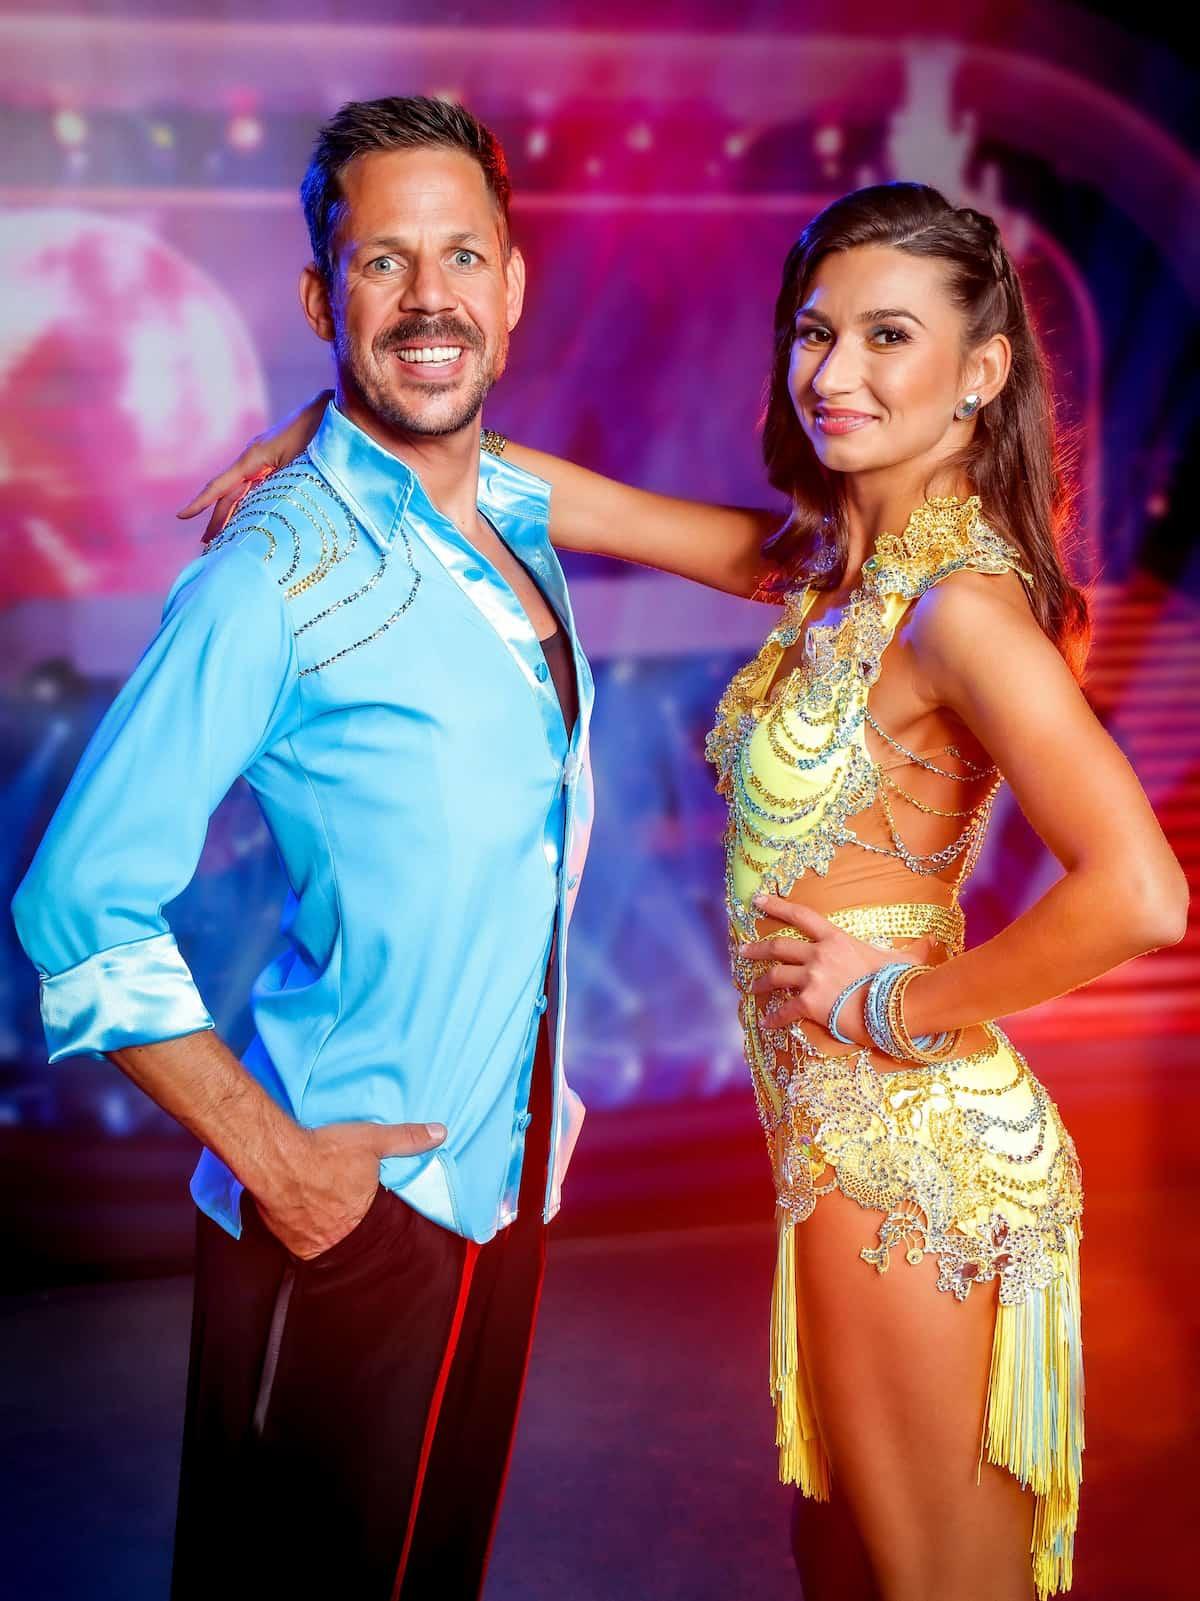 Bernhard Kohl und Vesela Dimova - Dancing Stars 8.10.2021